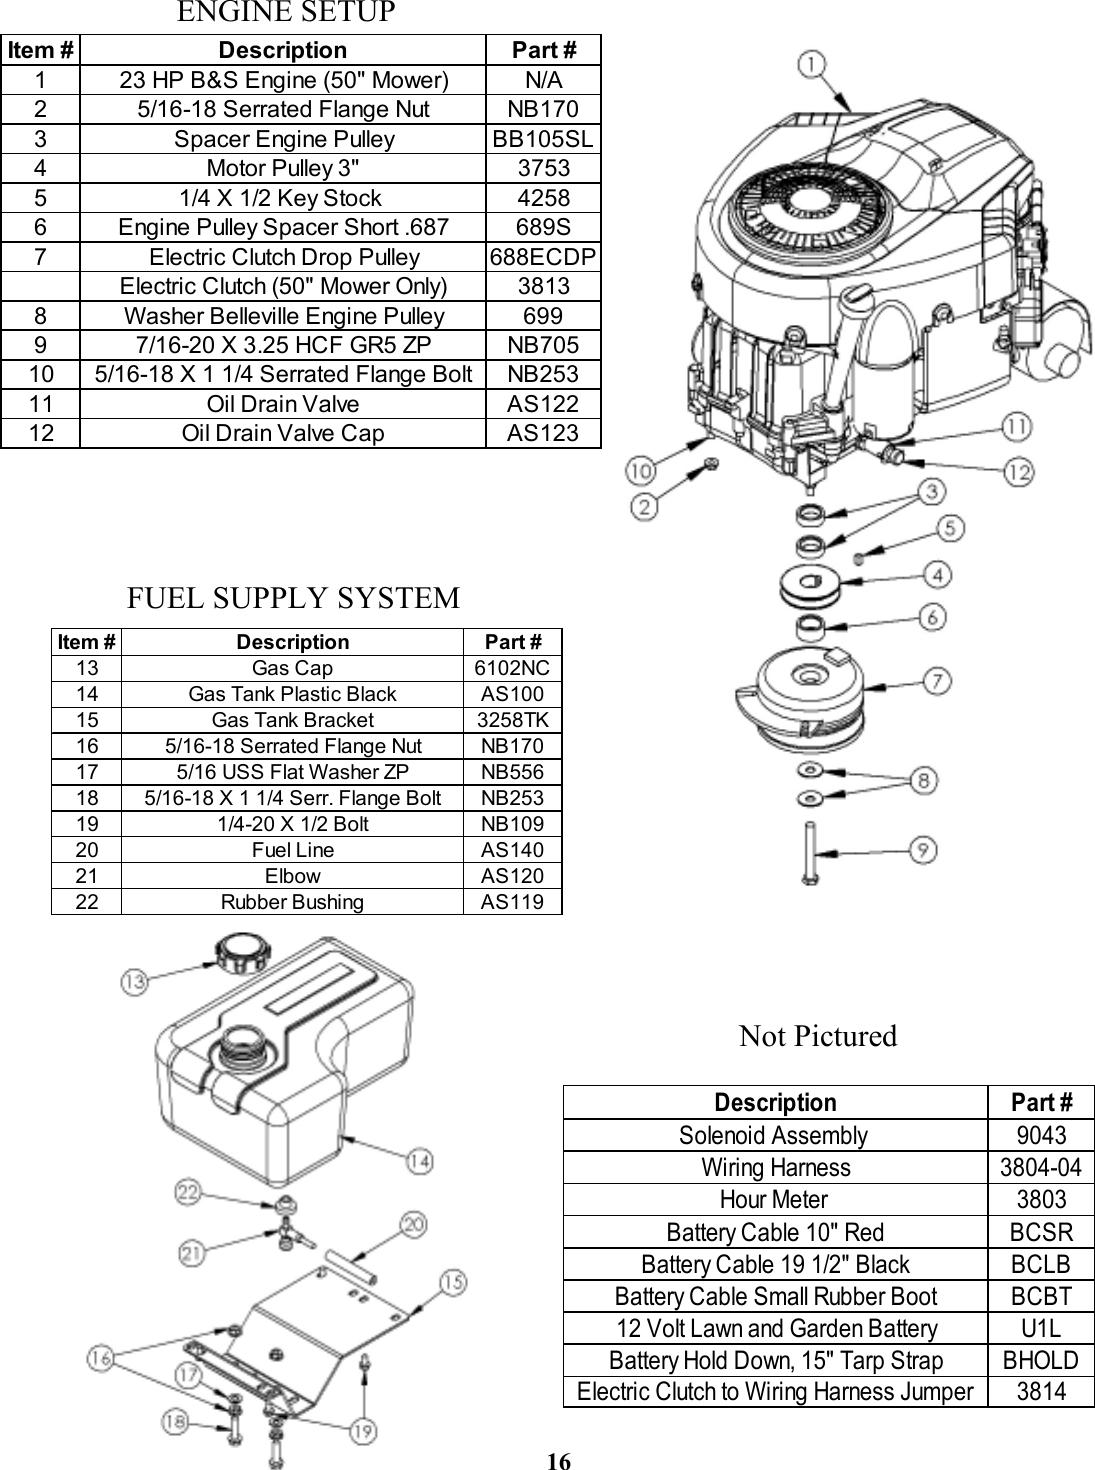 Microsoft 11847 Rev 05 353 Zt2350 Wiring Harness Plastic Cover